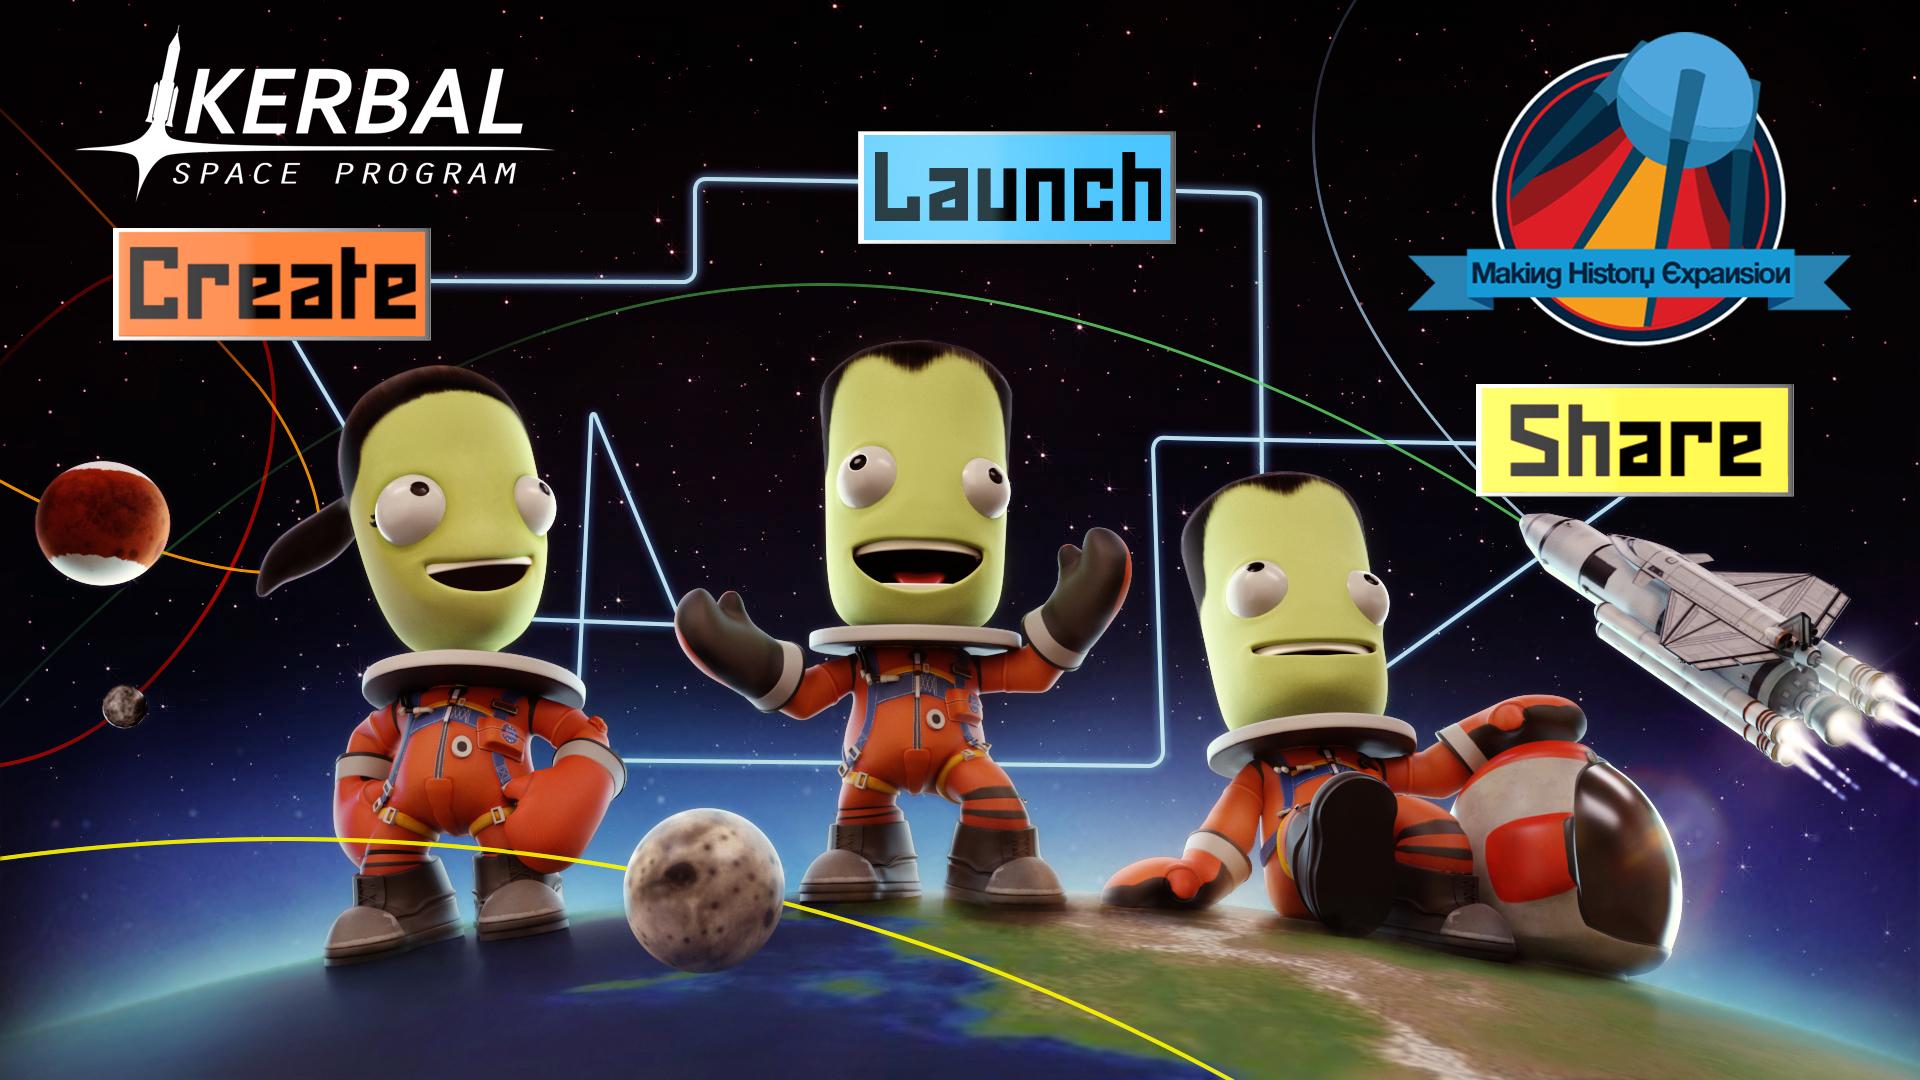 [Mini-Analisis] Kerbal Space Program: Making History (DLC) KSP_Making_History_Expansion_Final_Key_Art